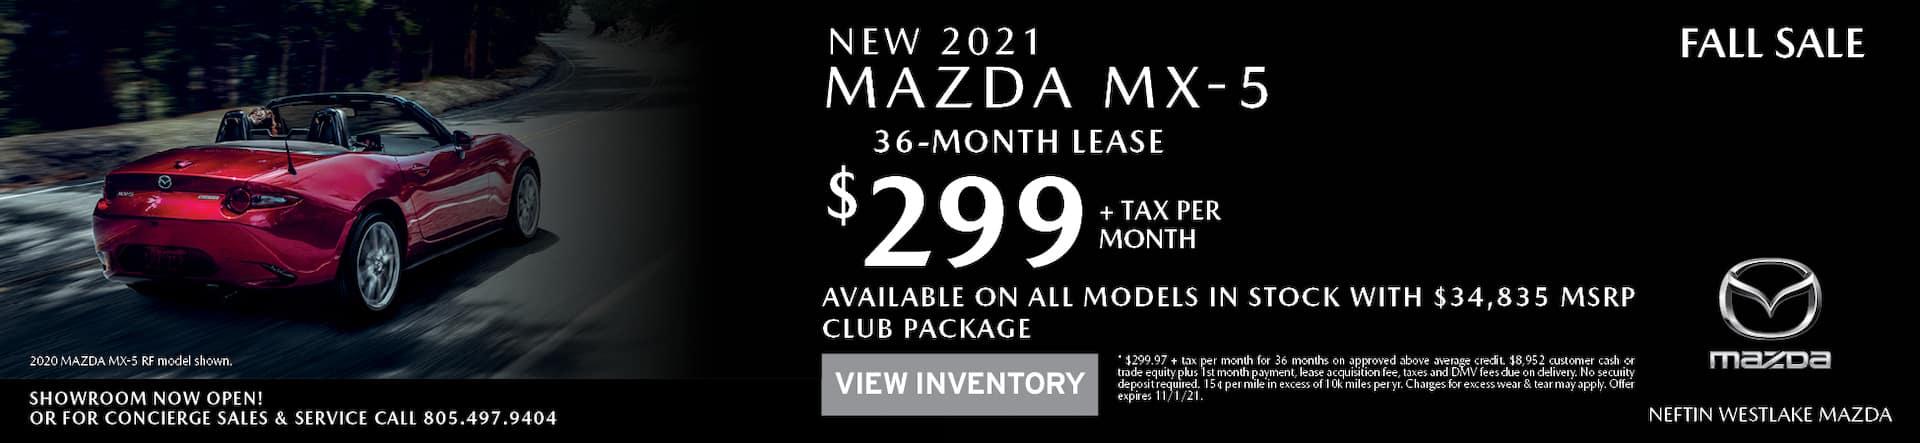 Neftin Westlake Mazda October 2021 MX5 Lease Offer